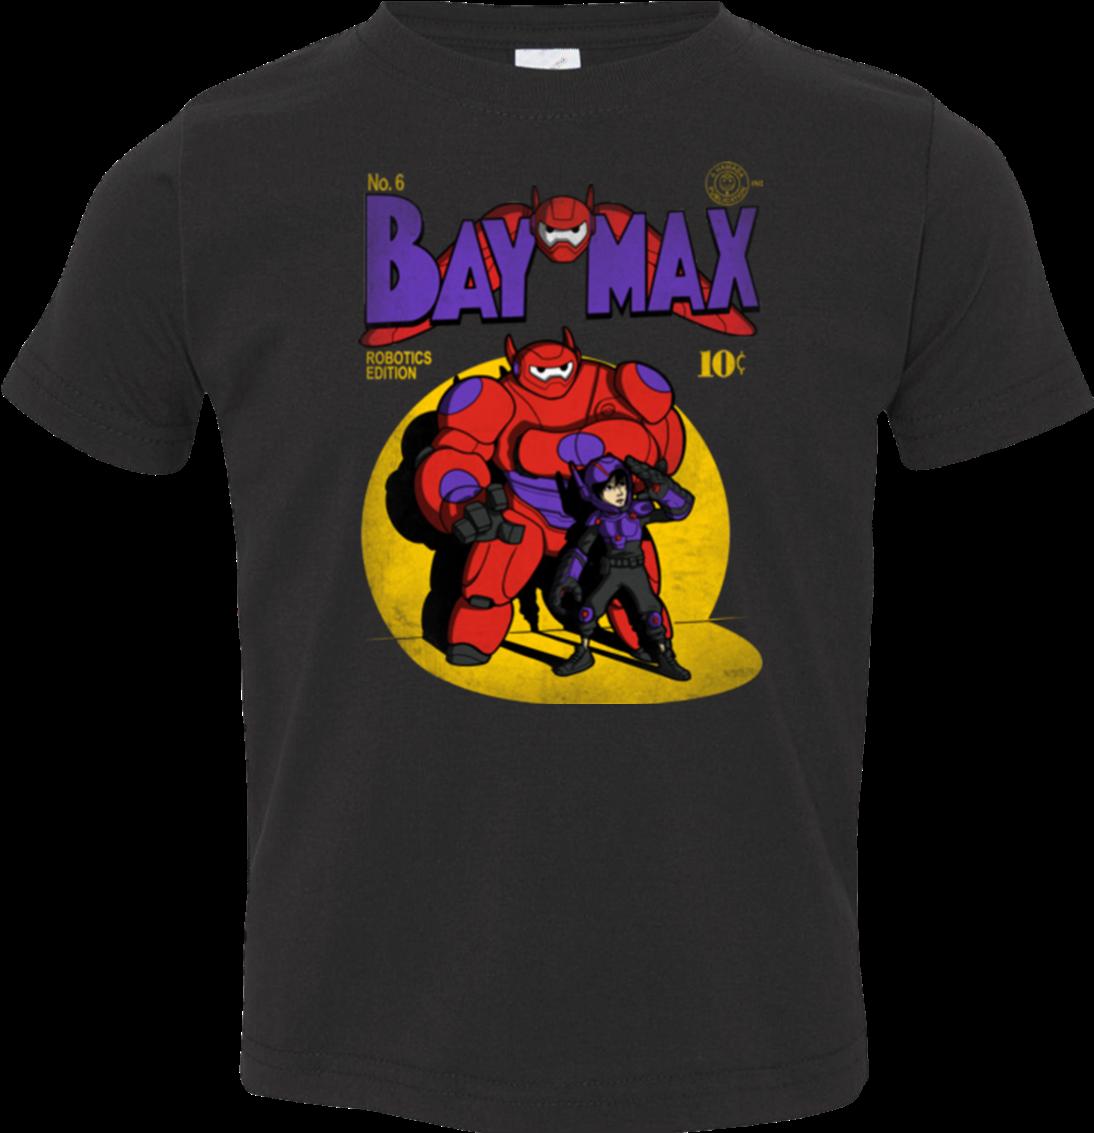 Baymax Transparent T Shirt - T-shirt (1155x1155), Png Download